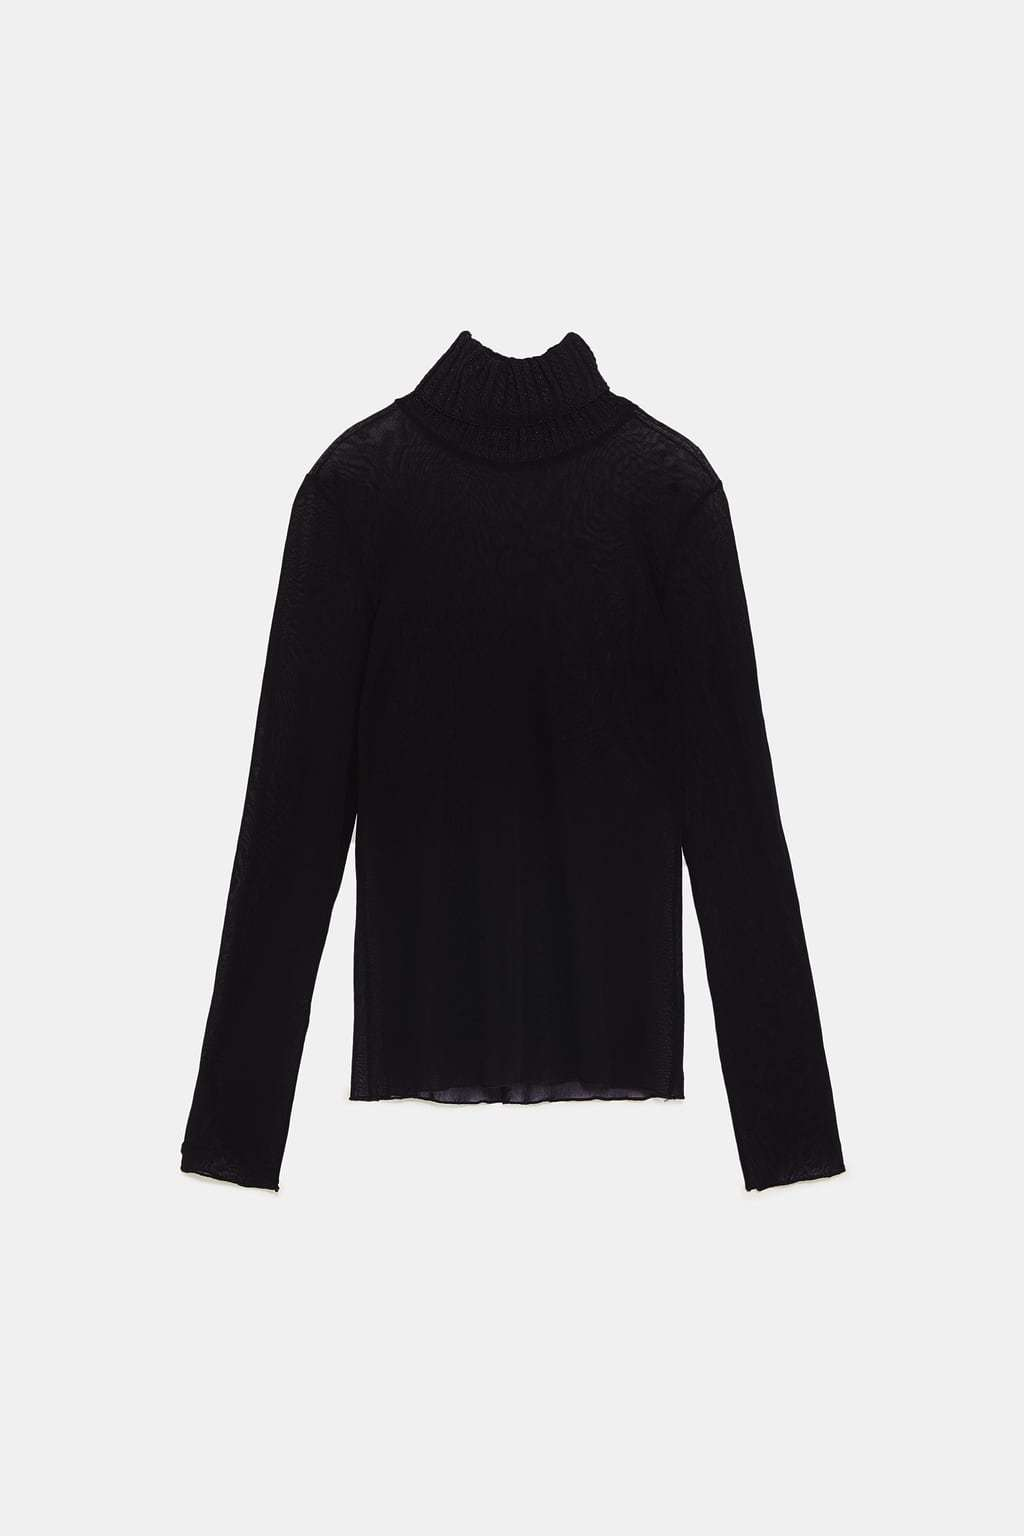 Camiseta en tull combinada de Zara. Precio 15,99 euros.